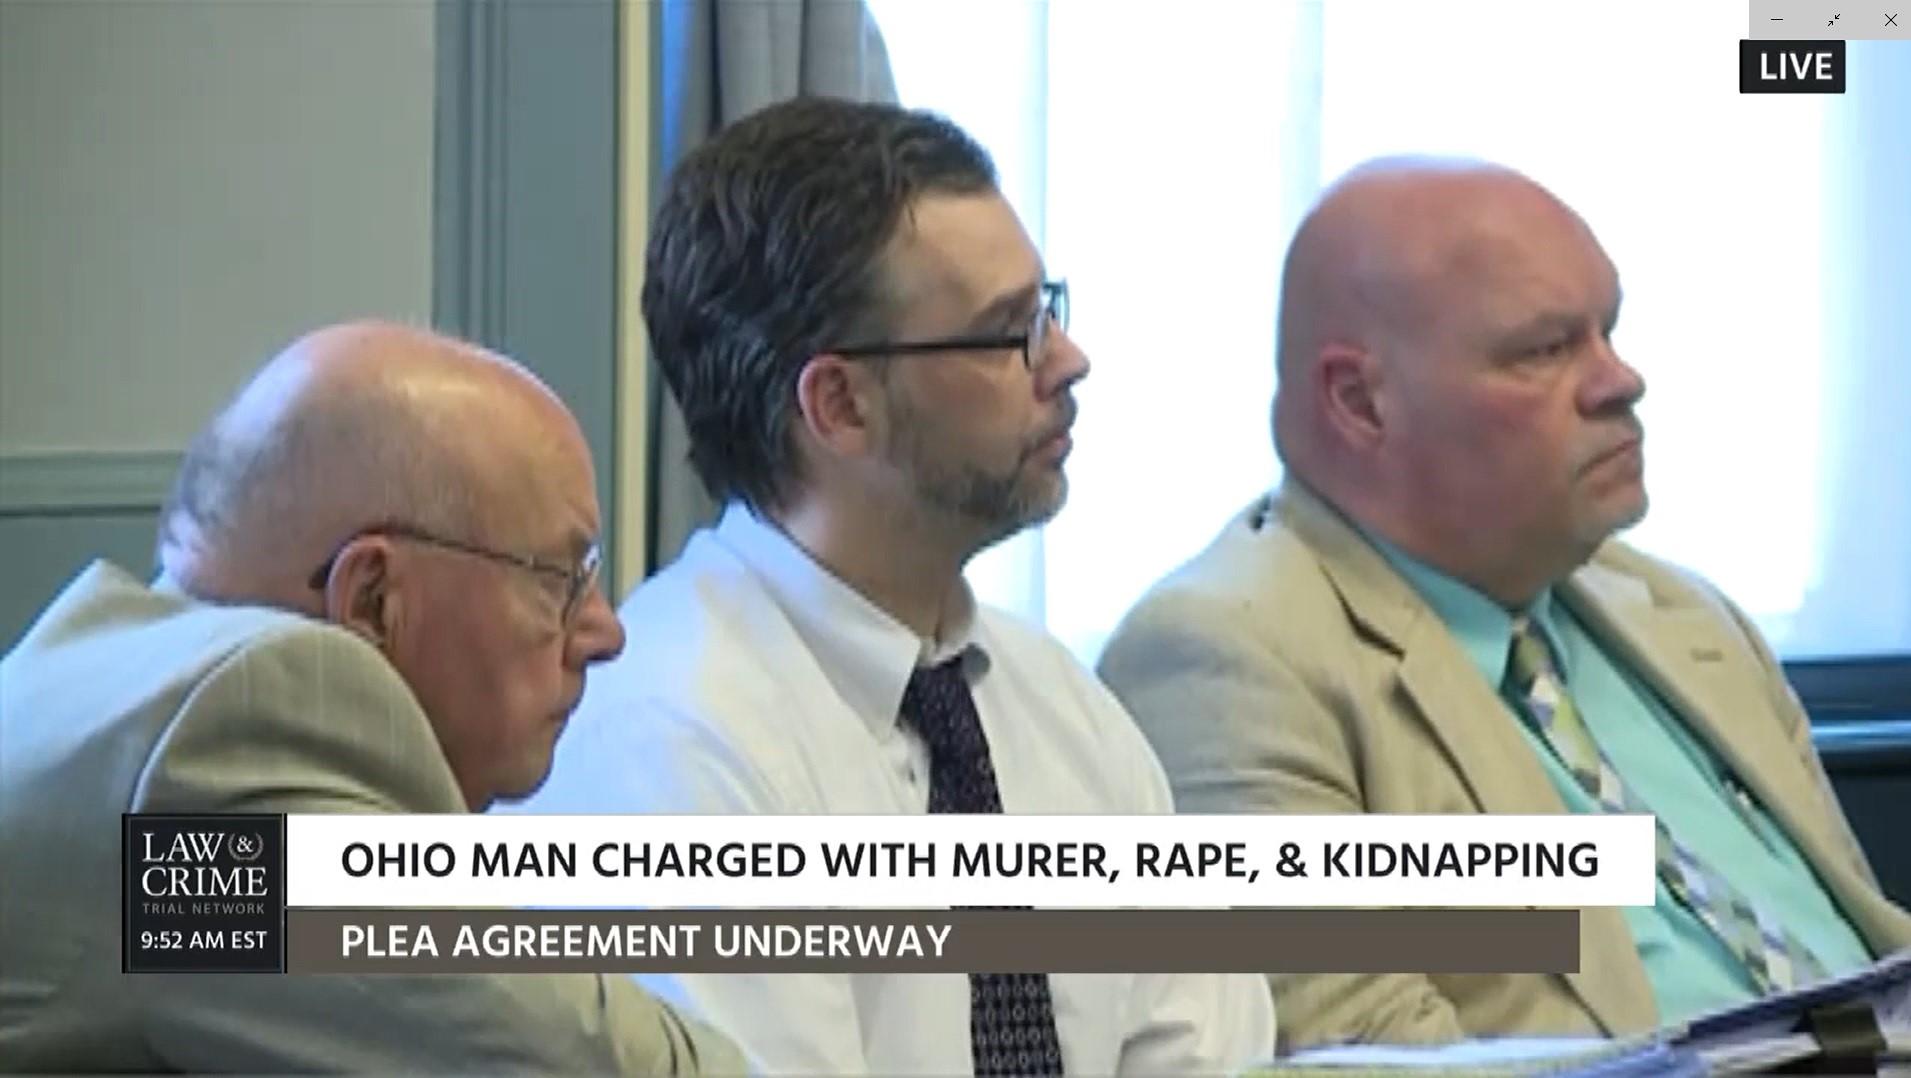 Shawn Grate, Ohio, Murder Trial, Rape, Plea Agreement